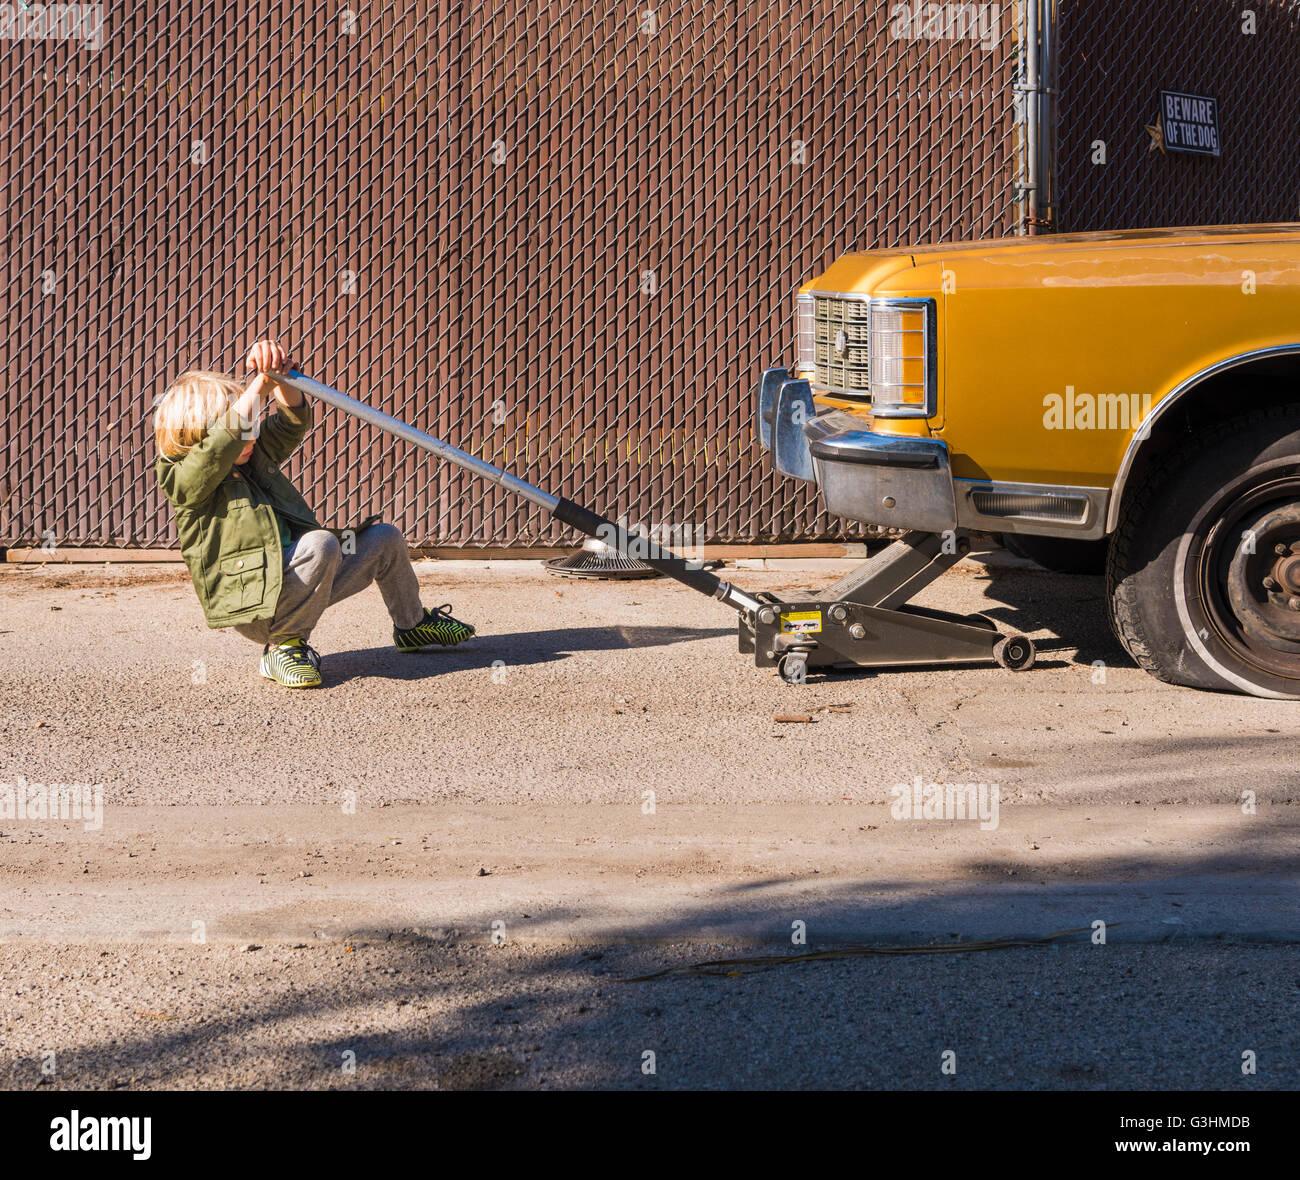 Boy using car jack to raise car - Stock Image